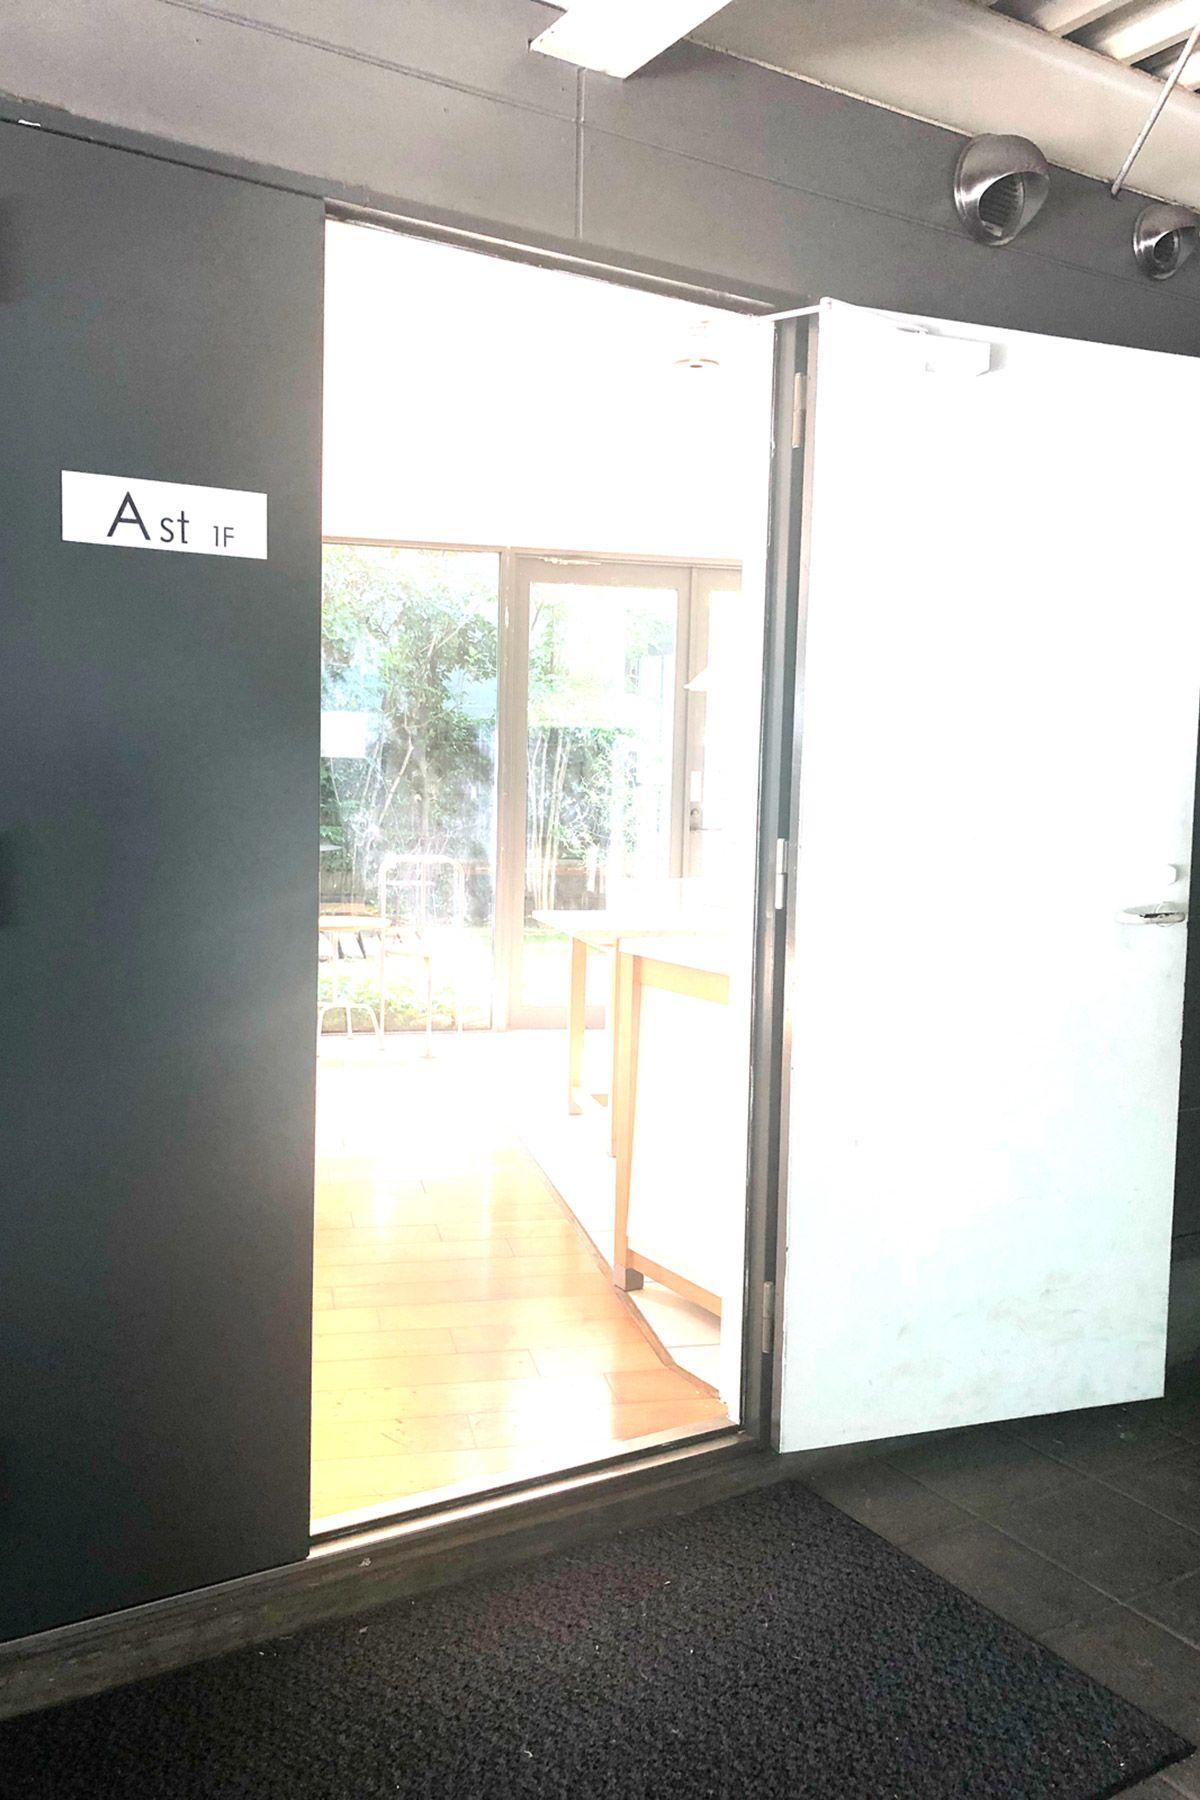 LIGHT BOX STUDIO 中野 Ast (ライトボックススタジオ)駐車場から室内